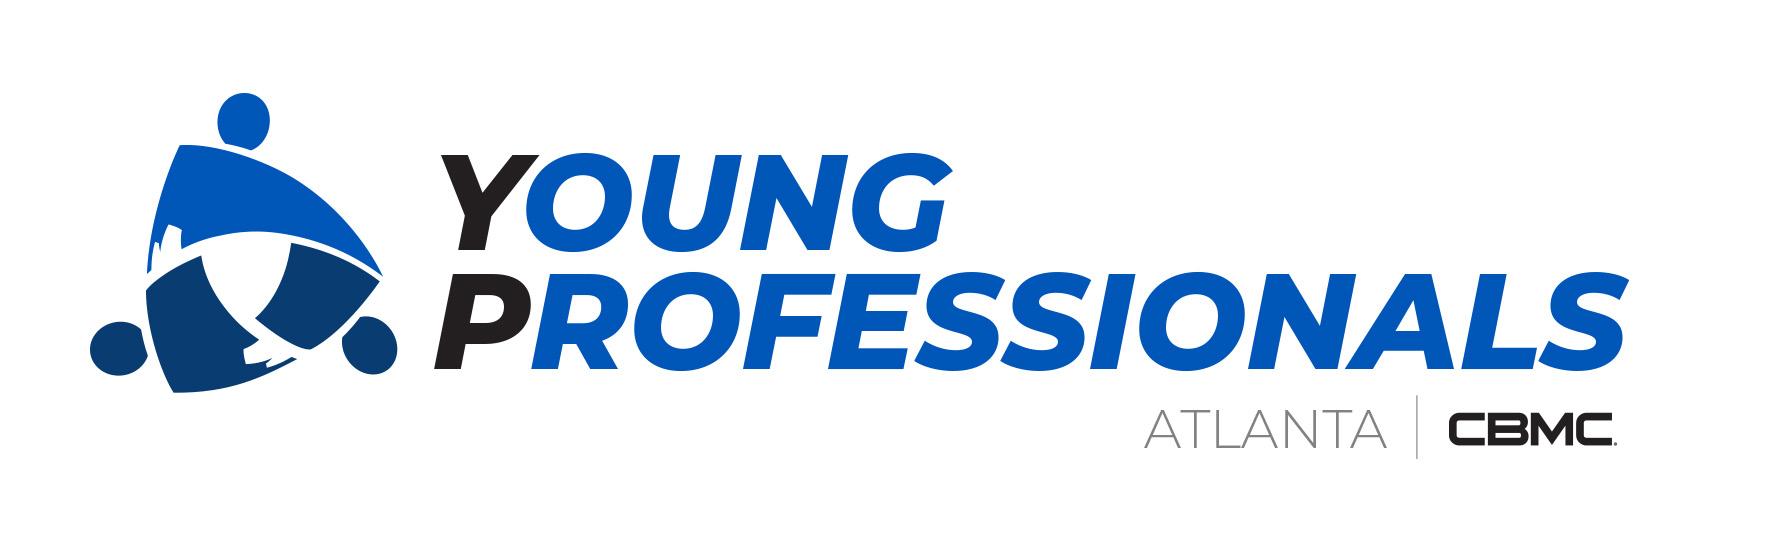 ATL YP blue and black logo